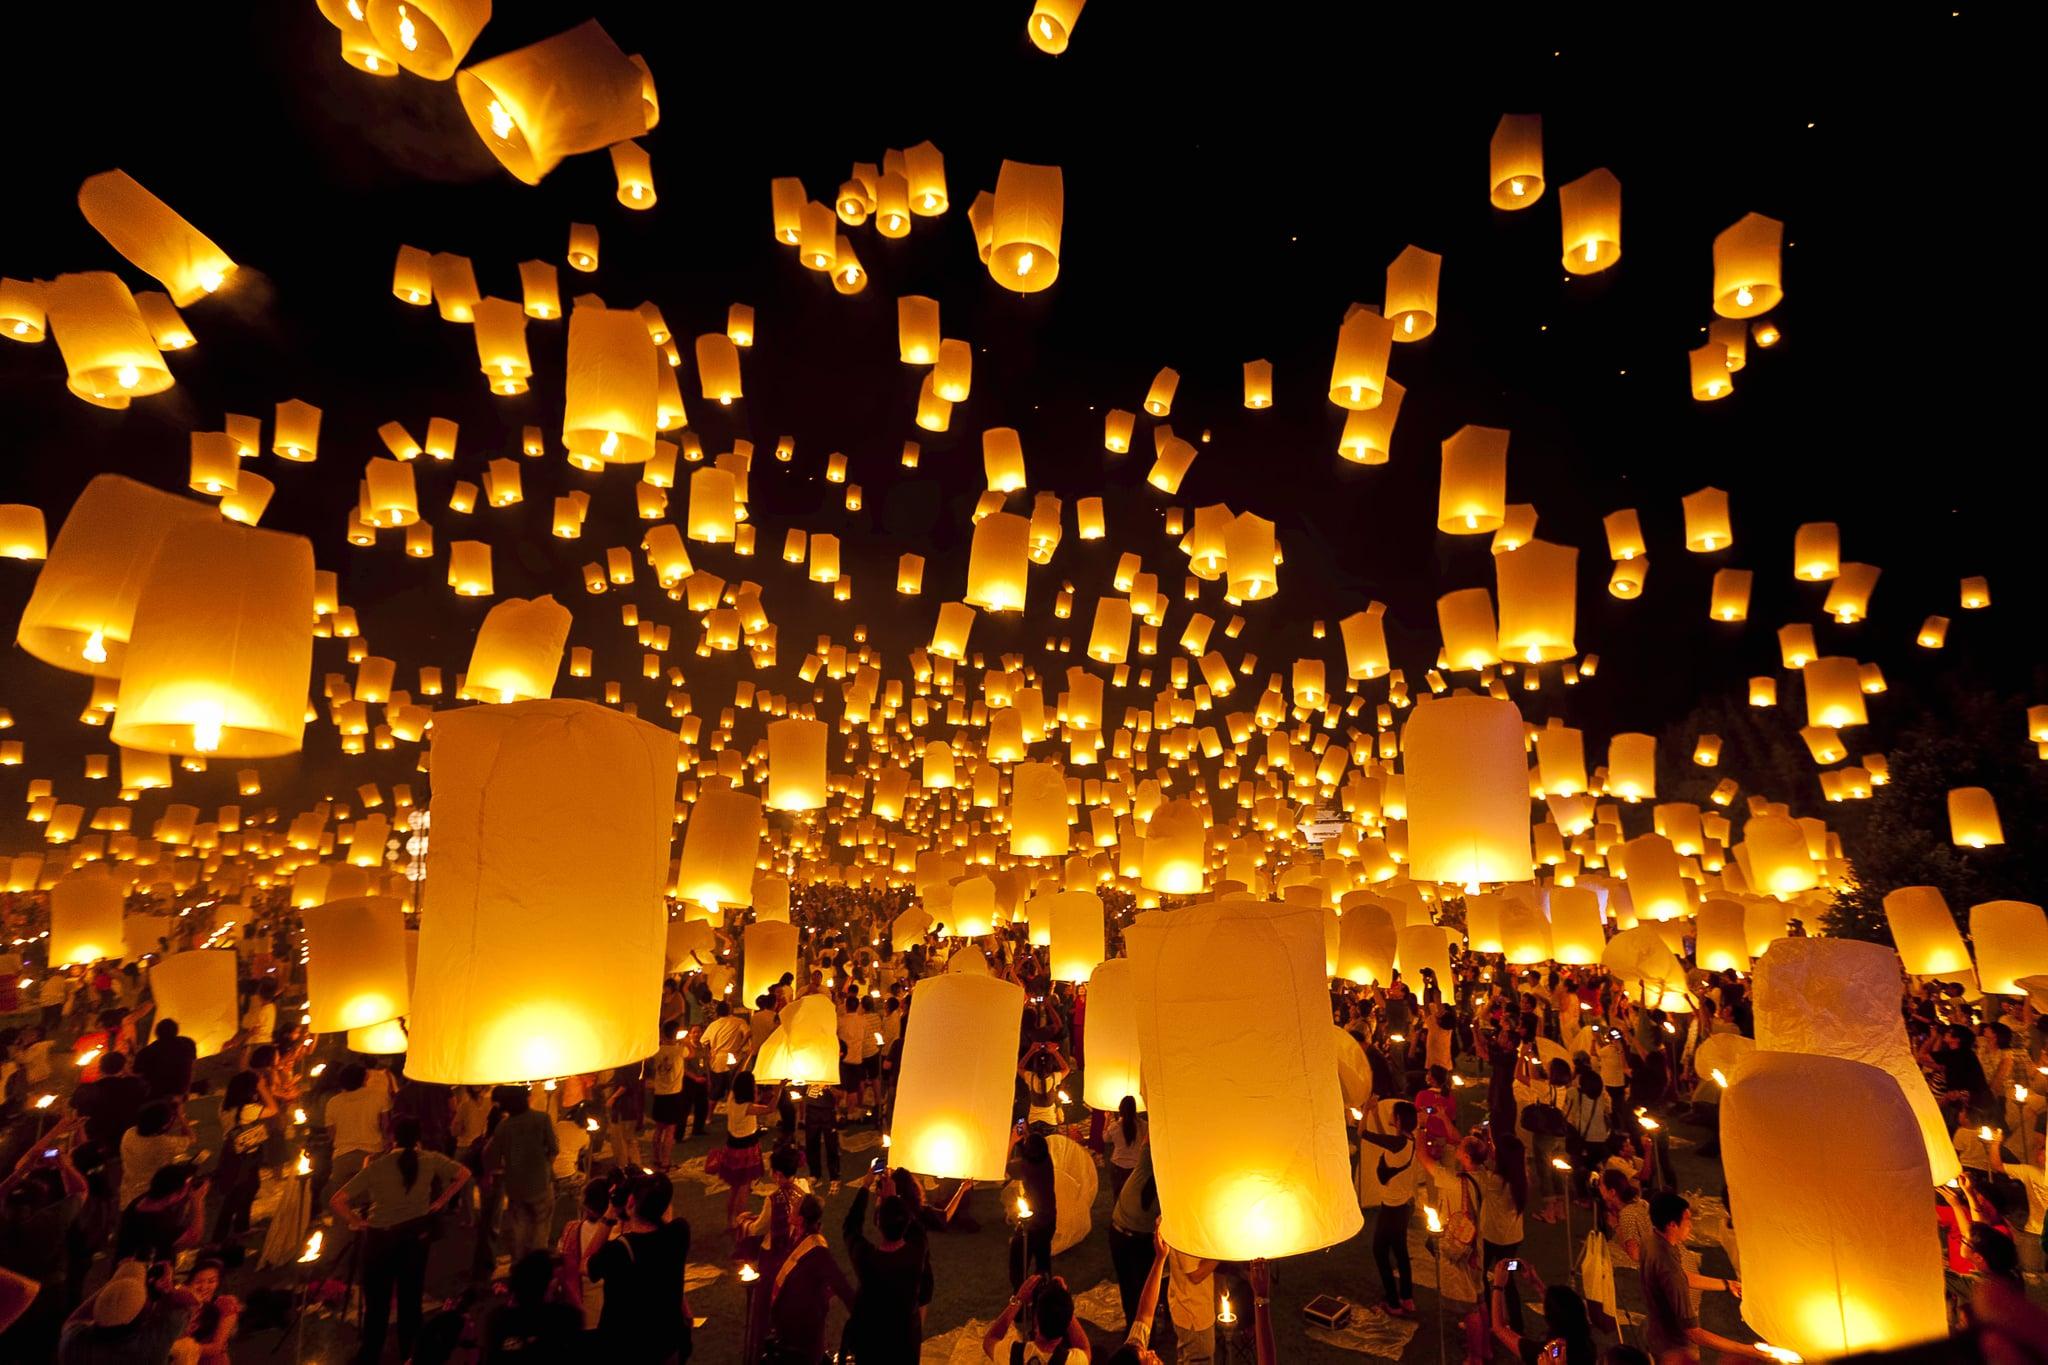 Floating Lantern Festival Thailand 83 Of The Most Beautiful Bucket List Destinations Around The World Popsugar Smart Living Photo 51